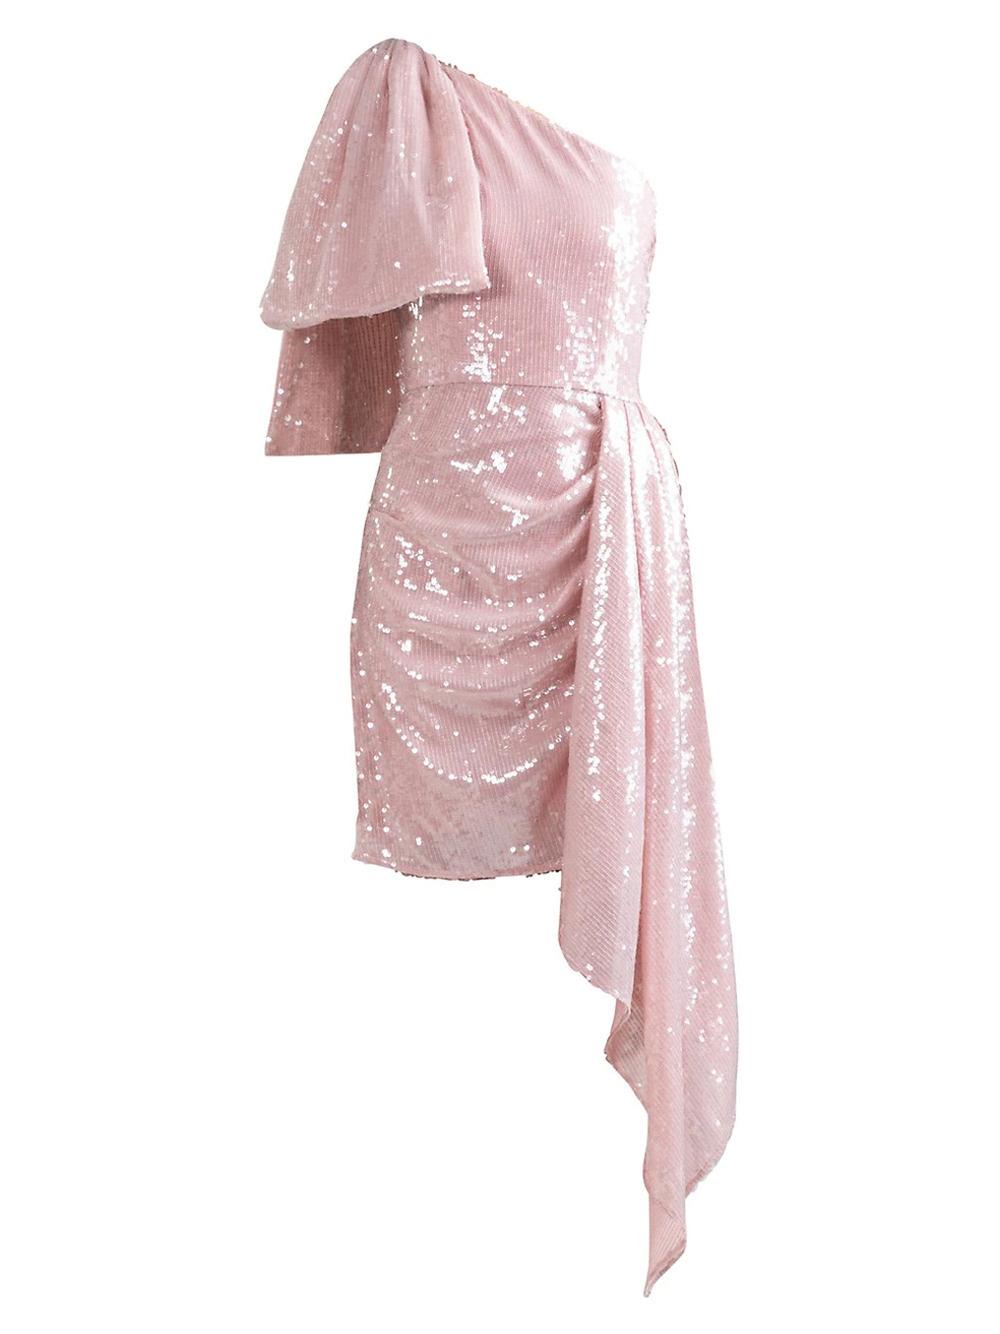 Blush Sequin Catalaya Dress Item # 6420911